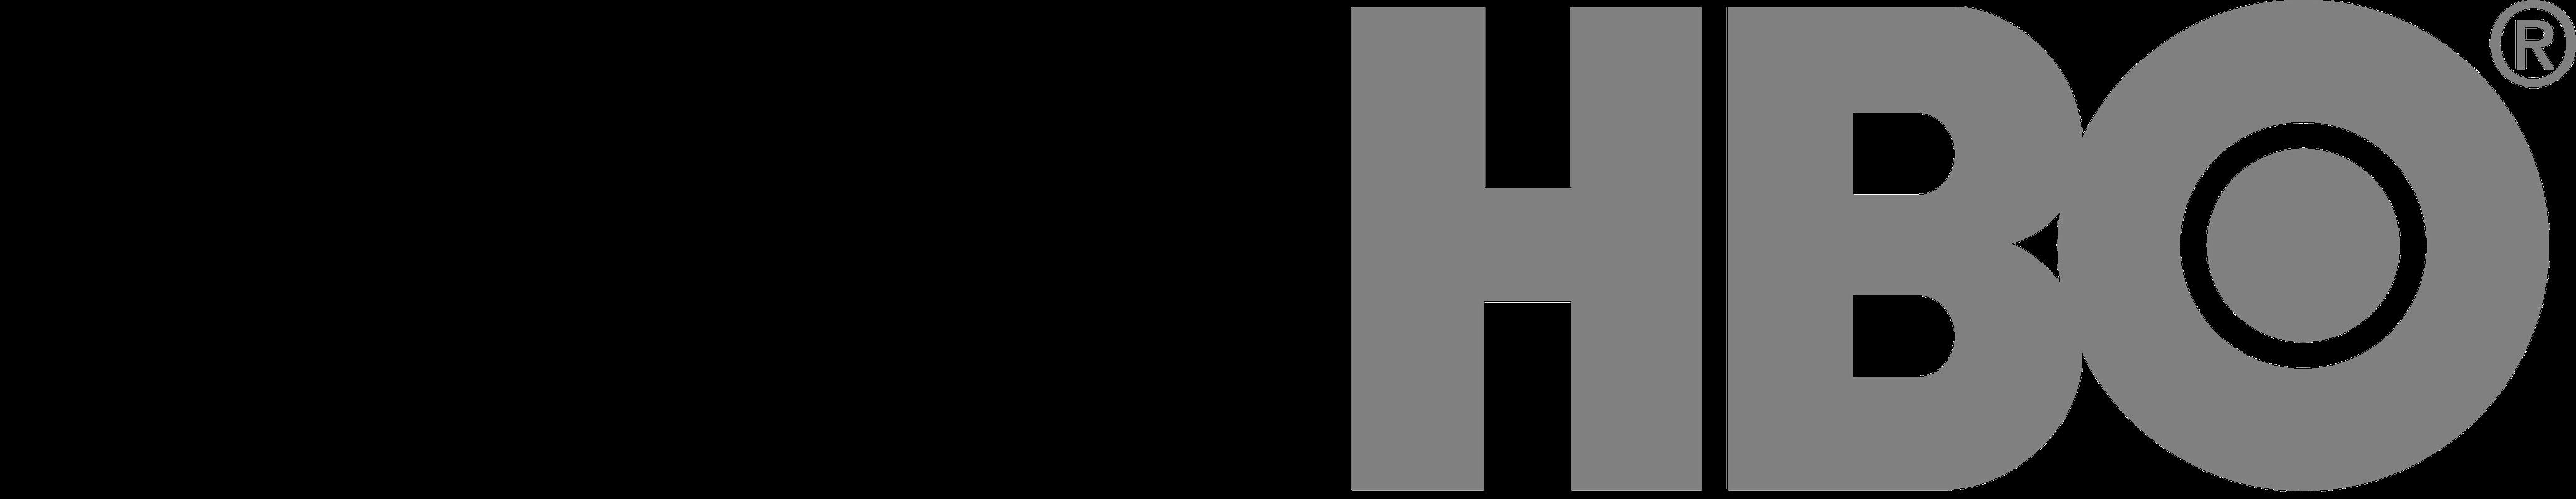 Hbo Logo Png White